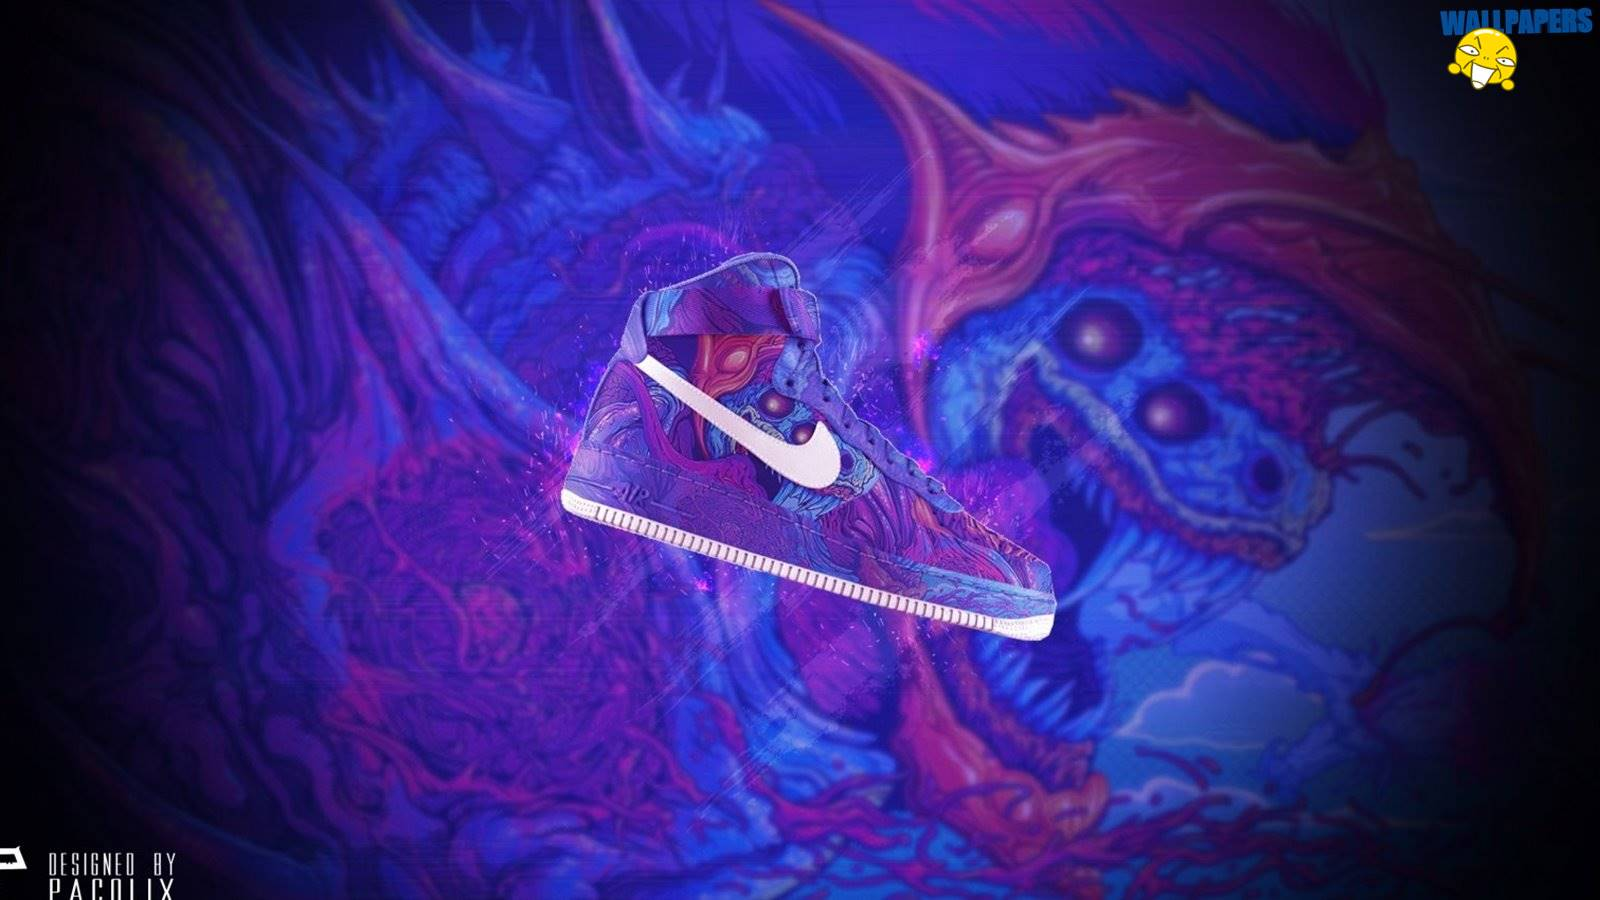 Nike air force hyperbeast wallpaper 1600215900 Creative 1600x900